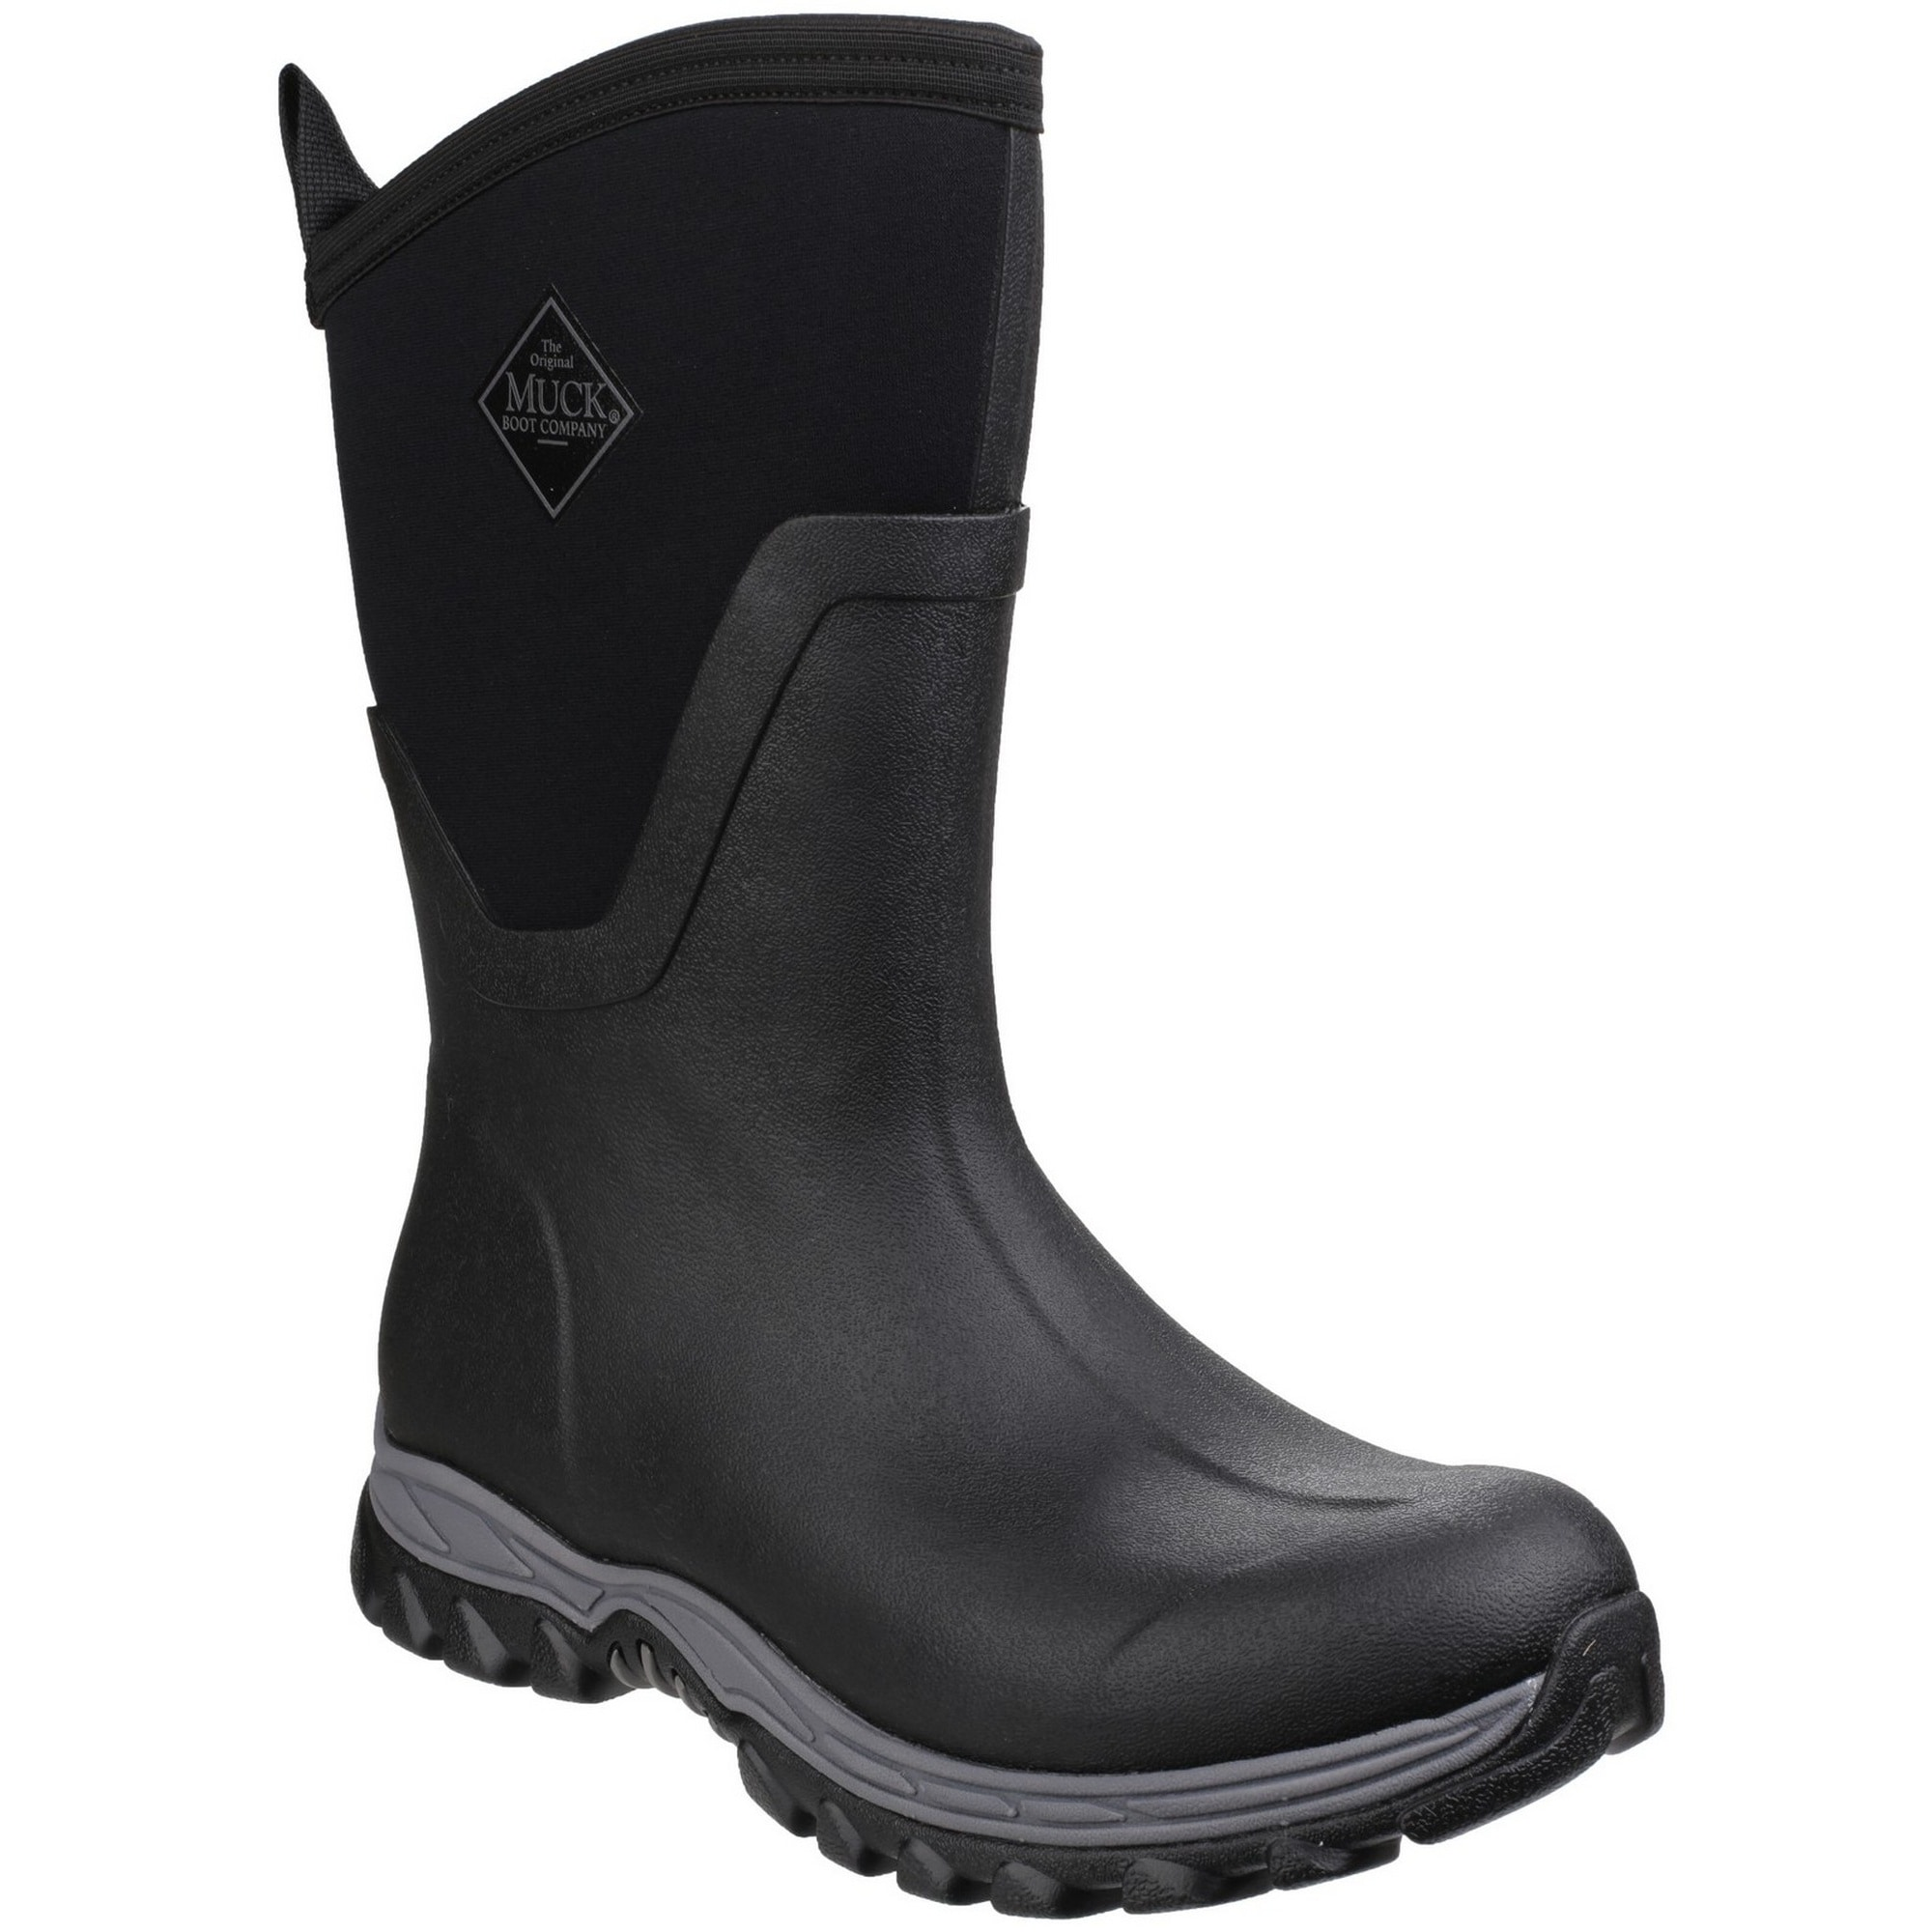 Muck Boots Gummistiefel Unisex Arctic Sport Mid Gummistielfel Damenmode/Schuhe/Stiefel/Langschaftstiefel